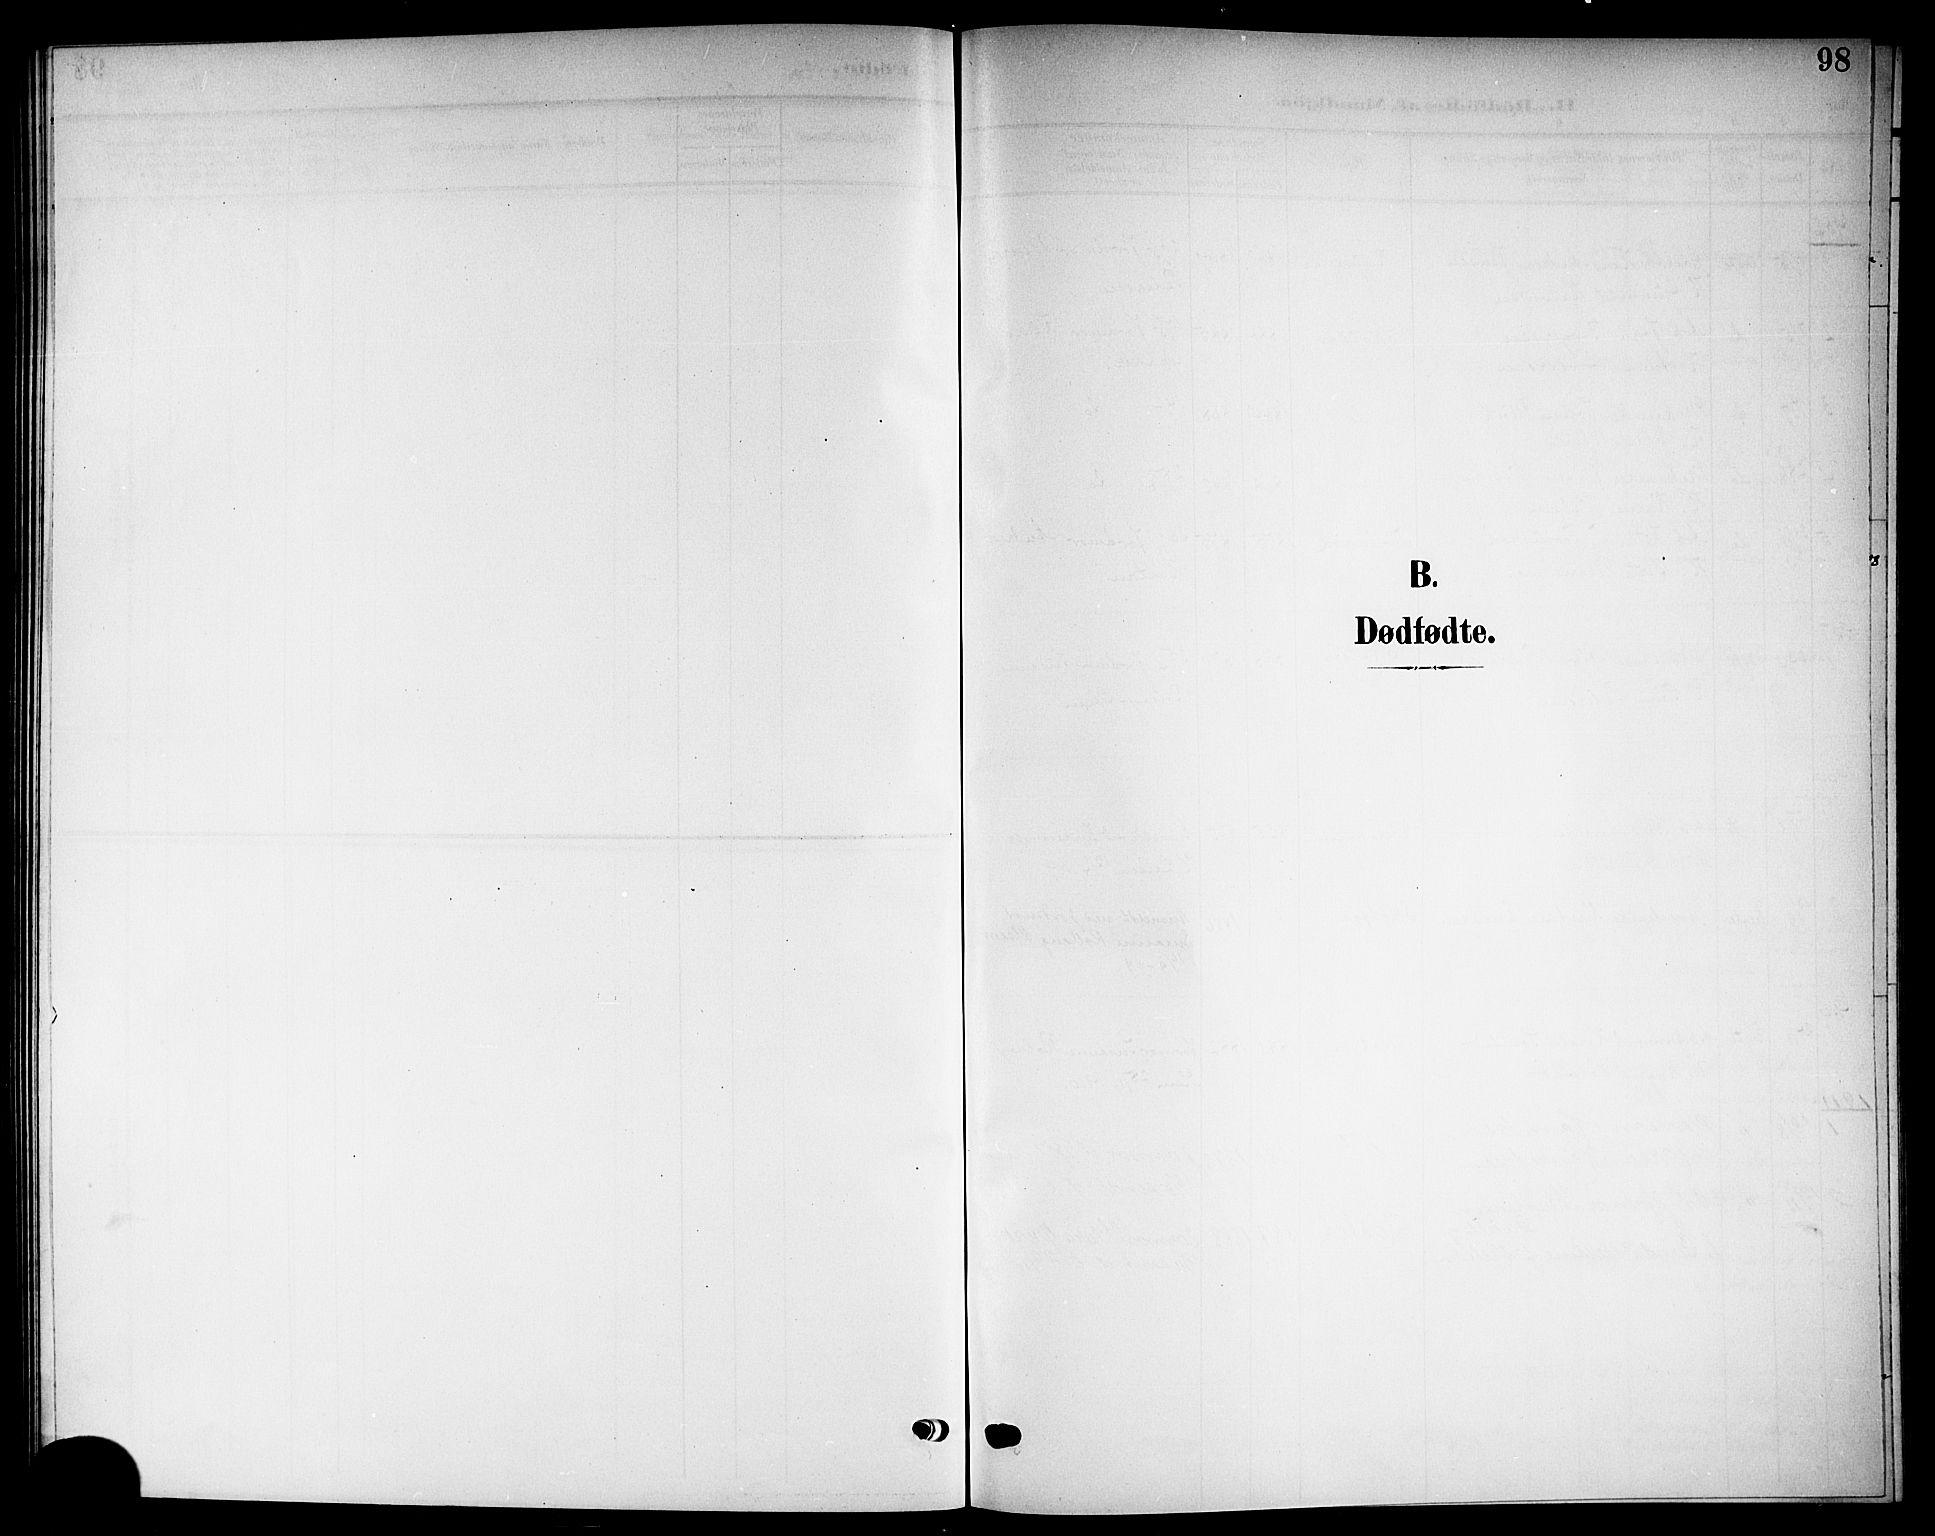 SAKO, Solum kirkebøker, G/Gb/L0005: Klokkerbok nr. II 5, 1905-1914, s. 98